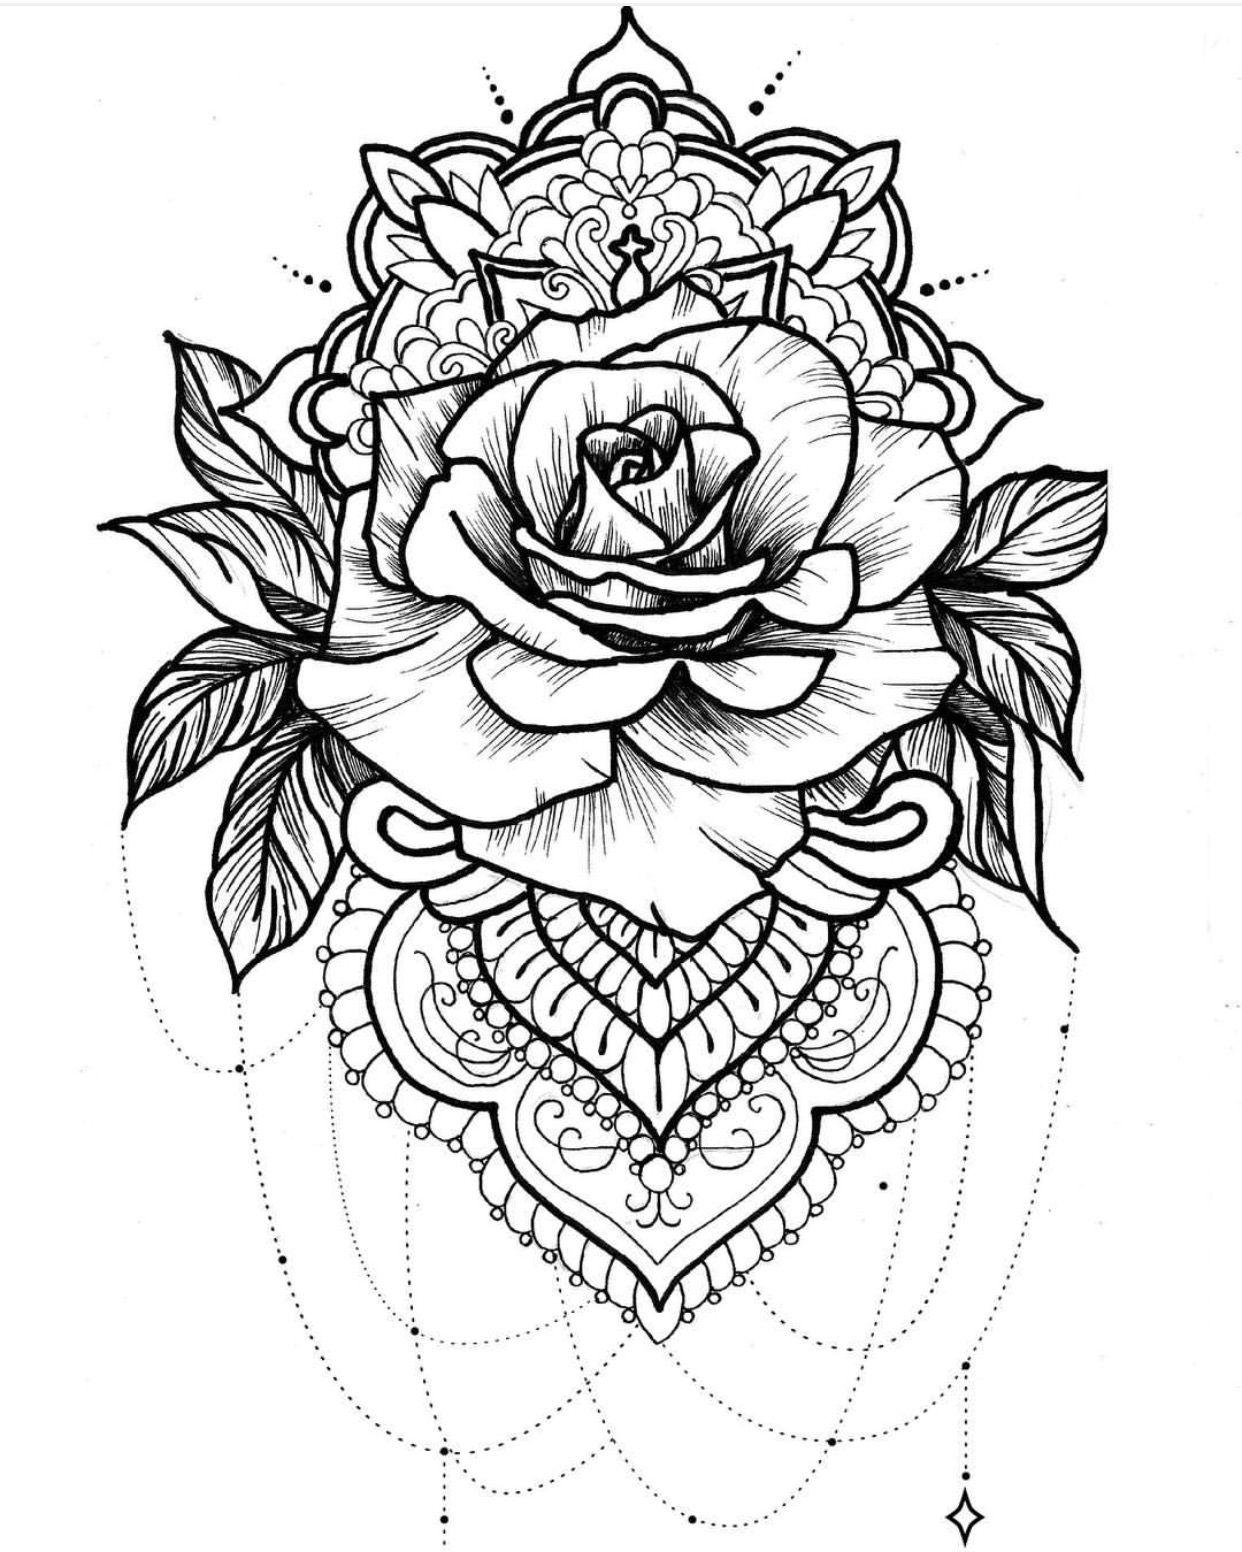 Pin de Kailey Brianna en Tattooos | Pinterest | Tatuajes, Ideas de ...